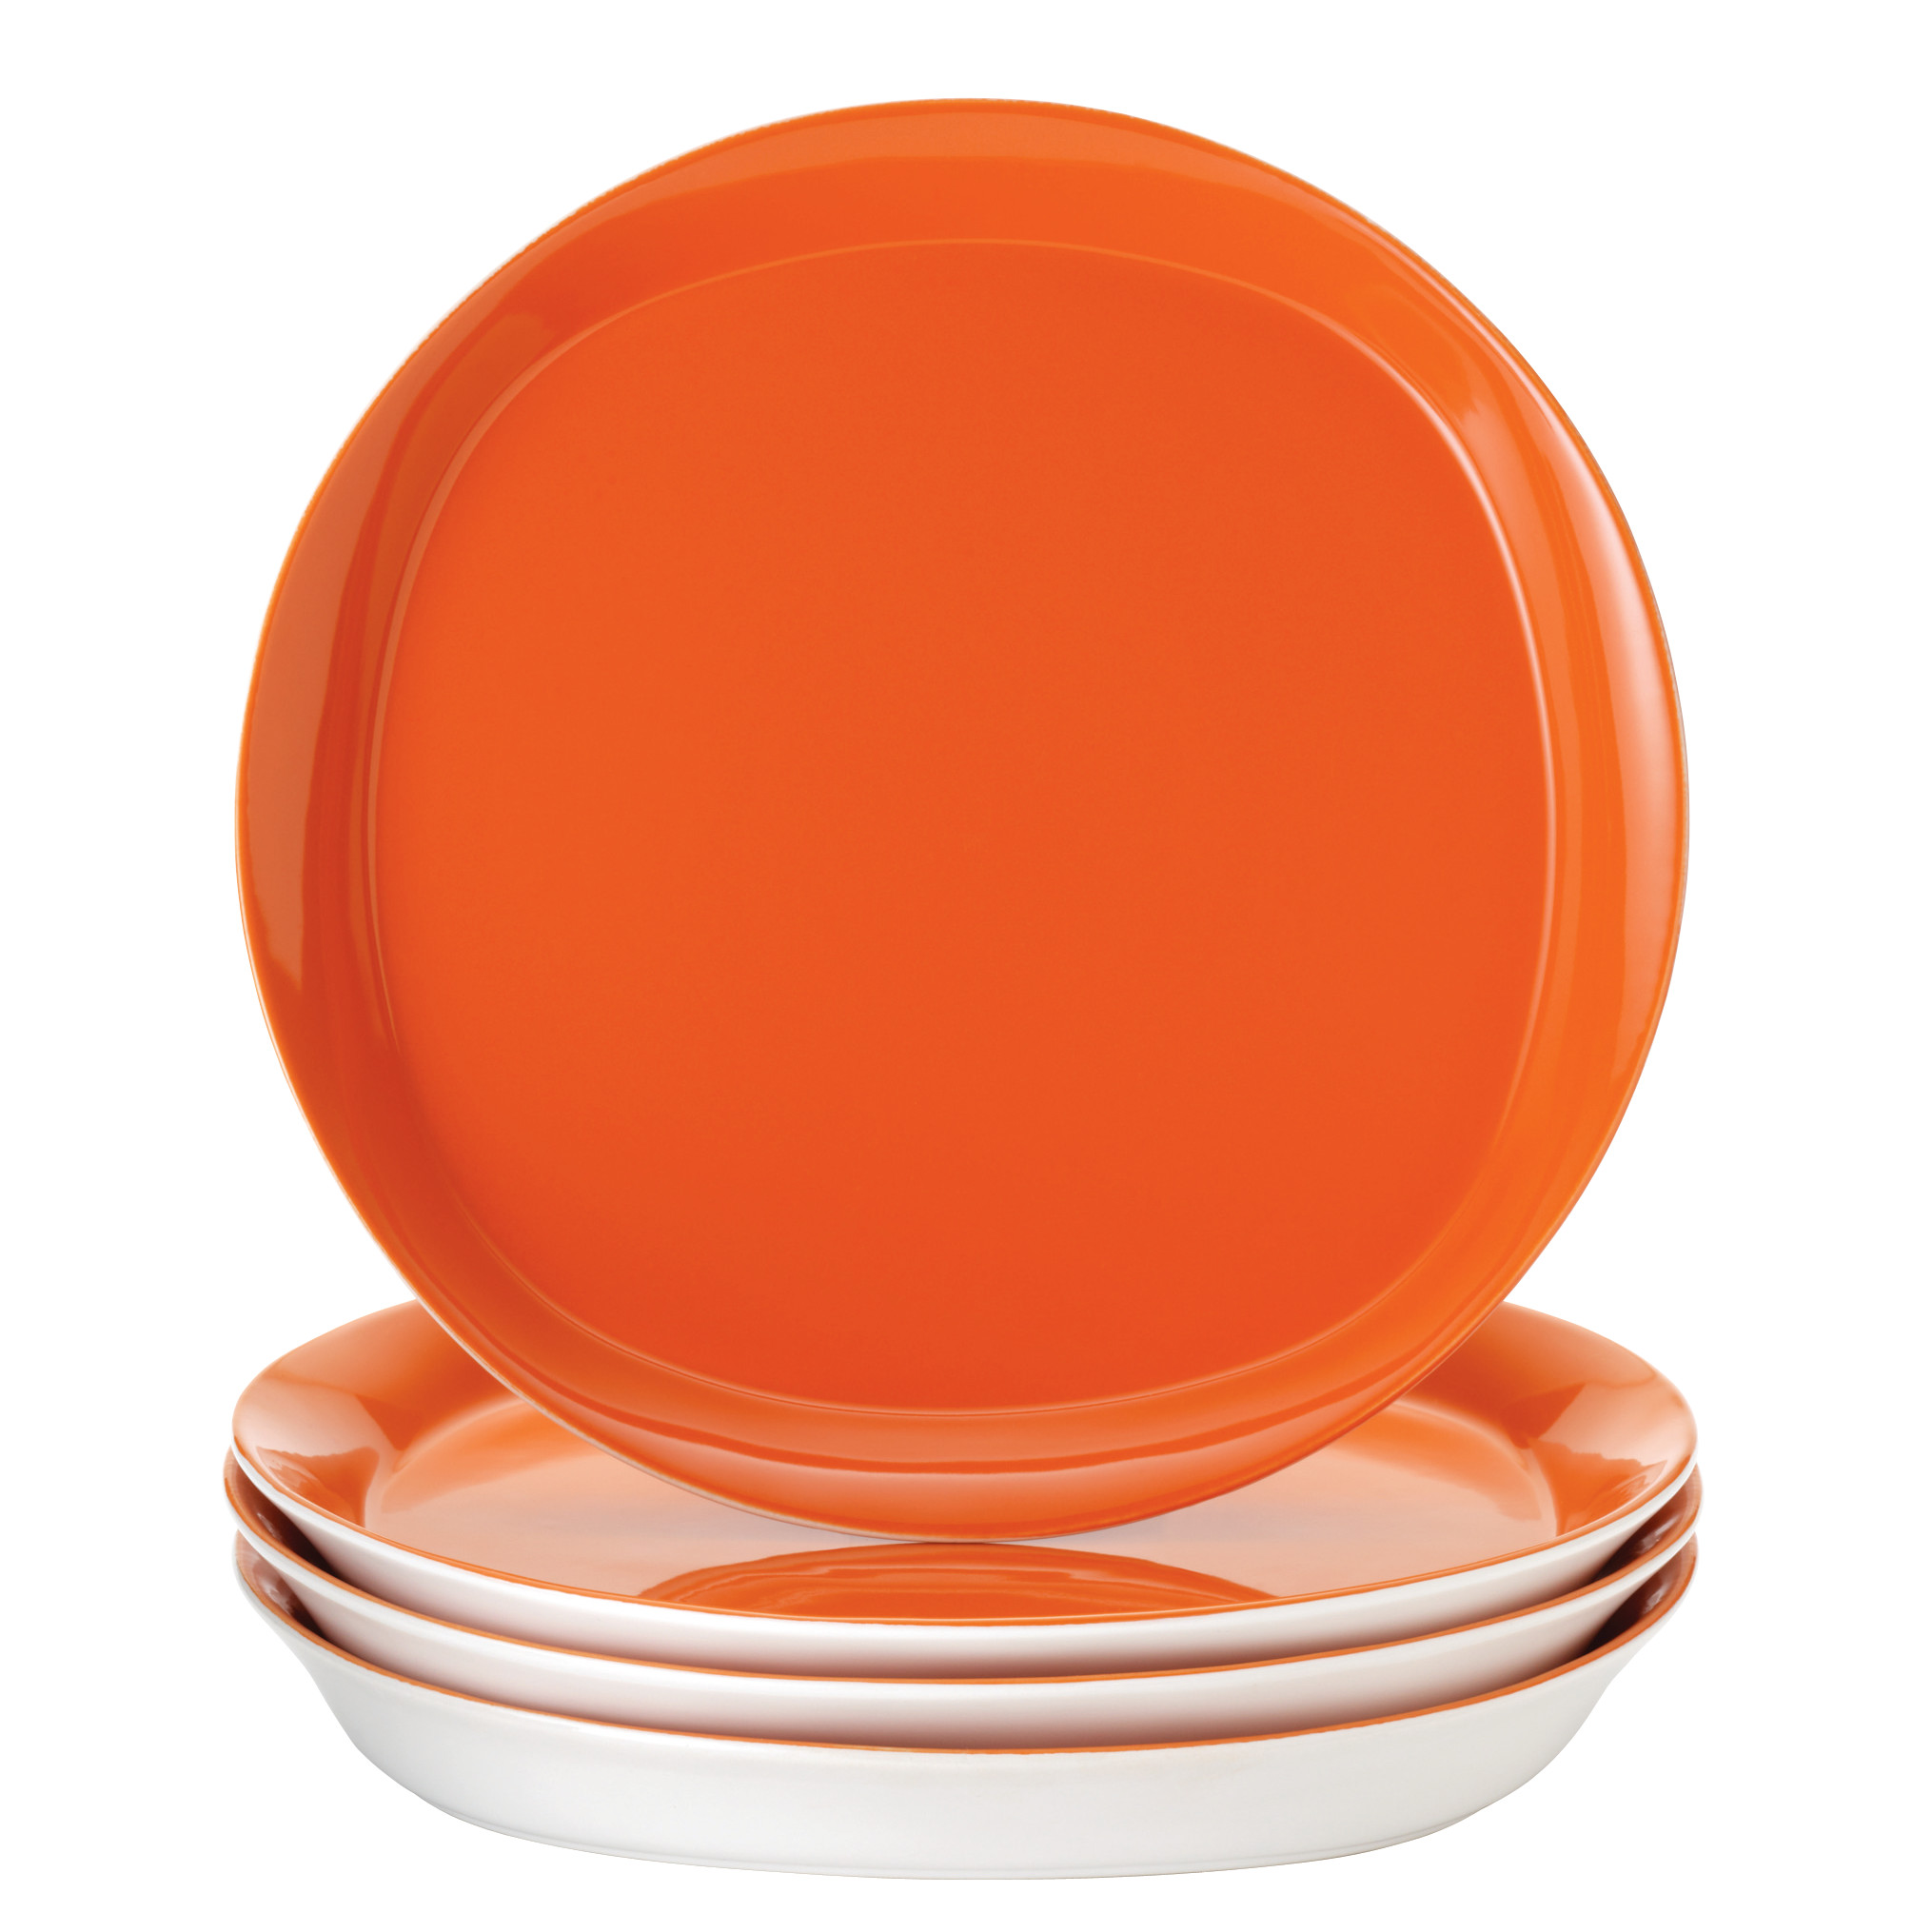 Rachael Ray Dinnerware Round and Square 4-Piece Stoneware Dinner Plate Set, Orange